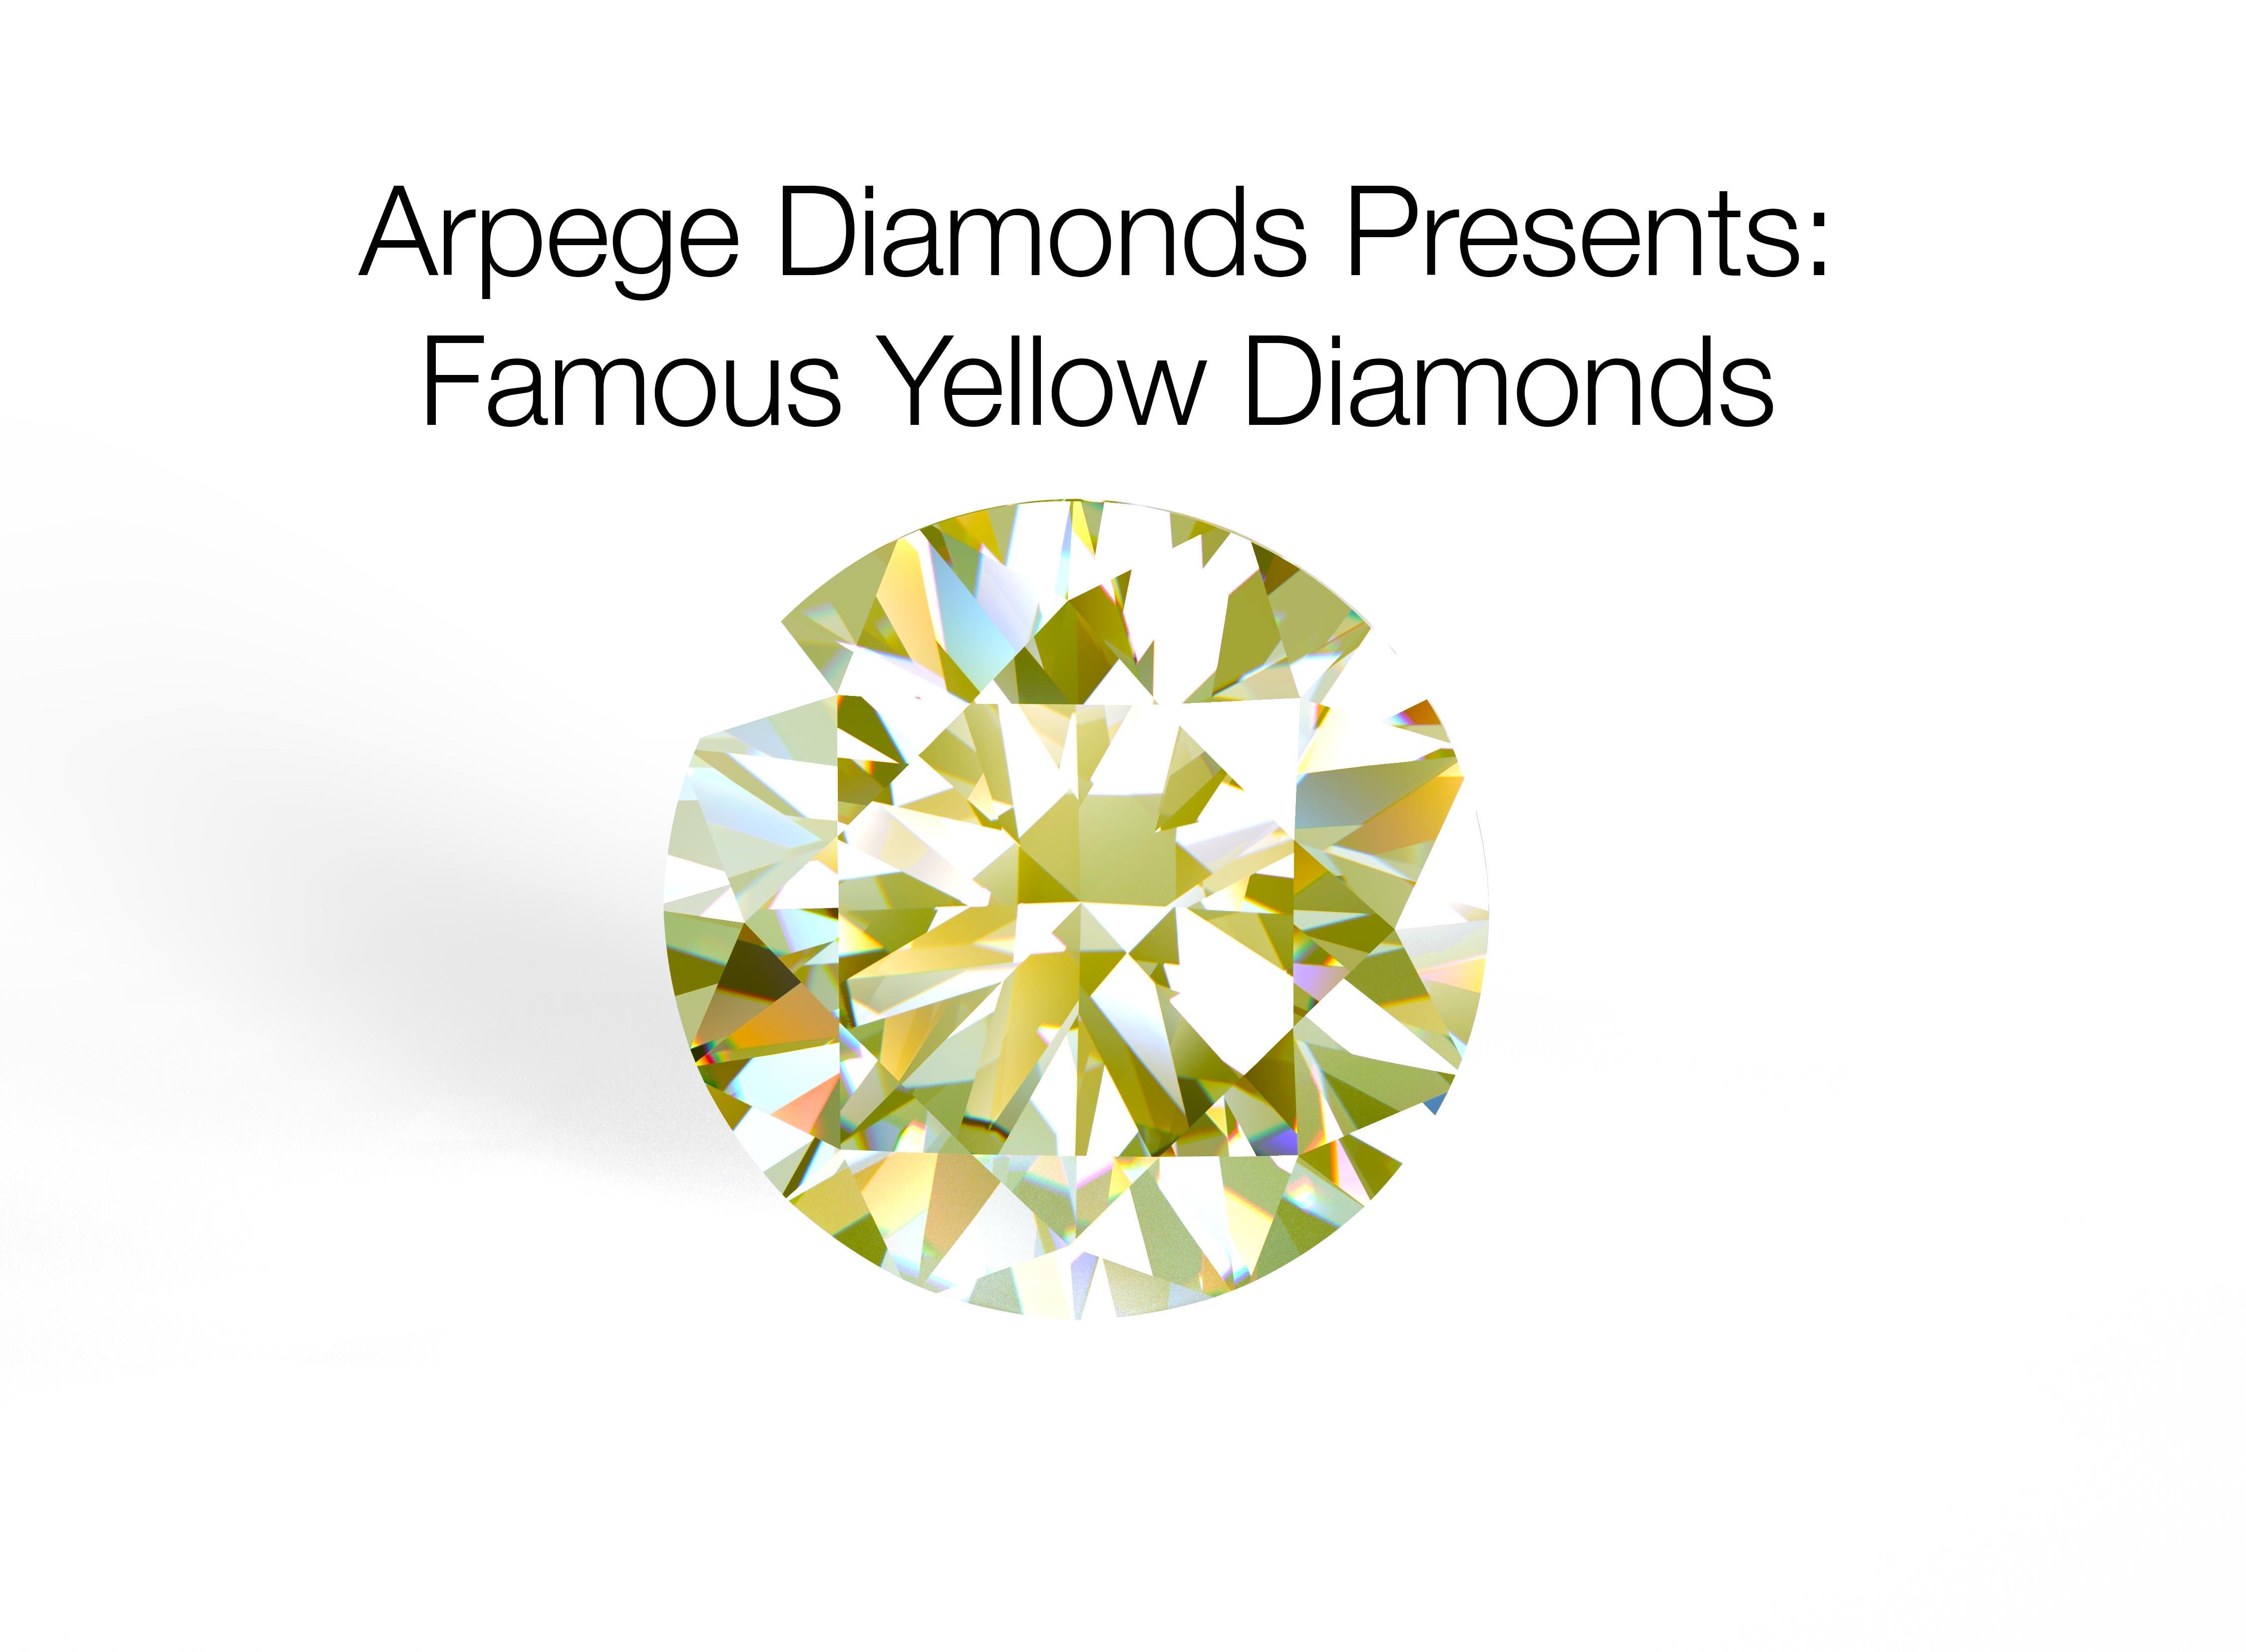 famous_yellow_diamonds.jpg